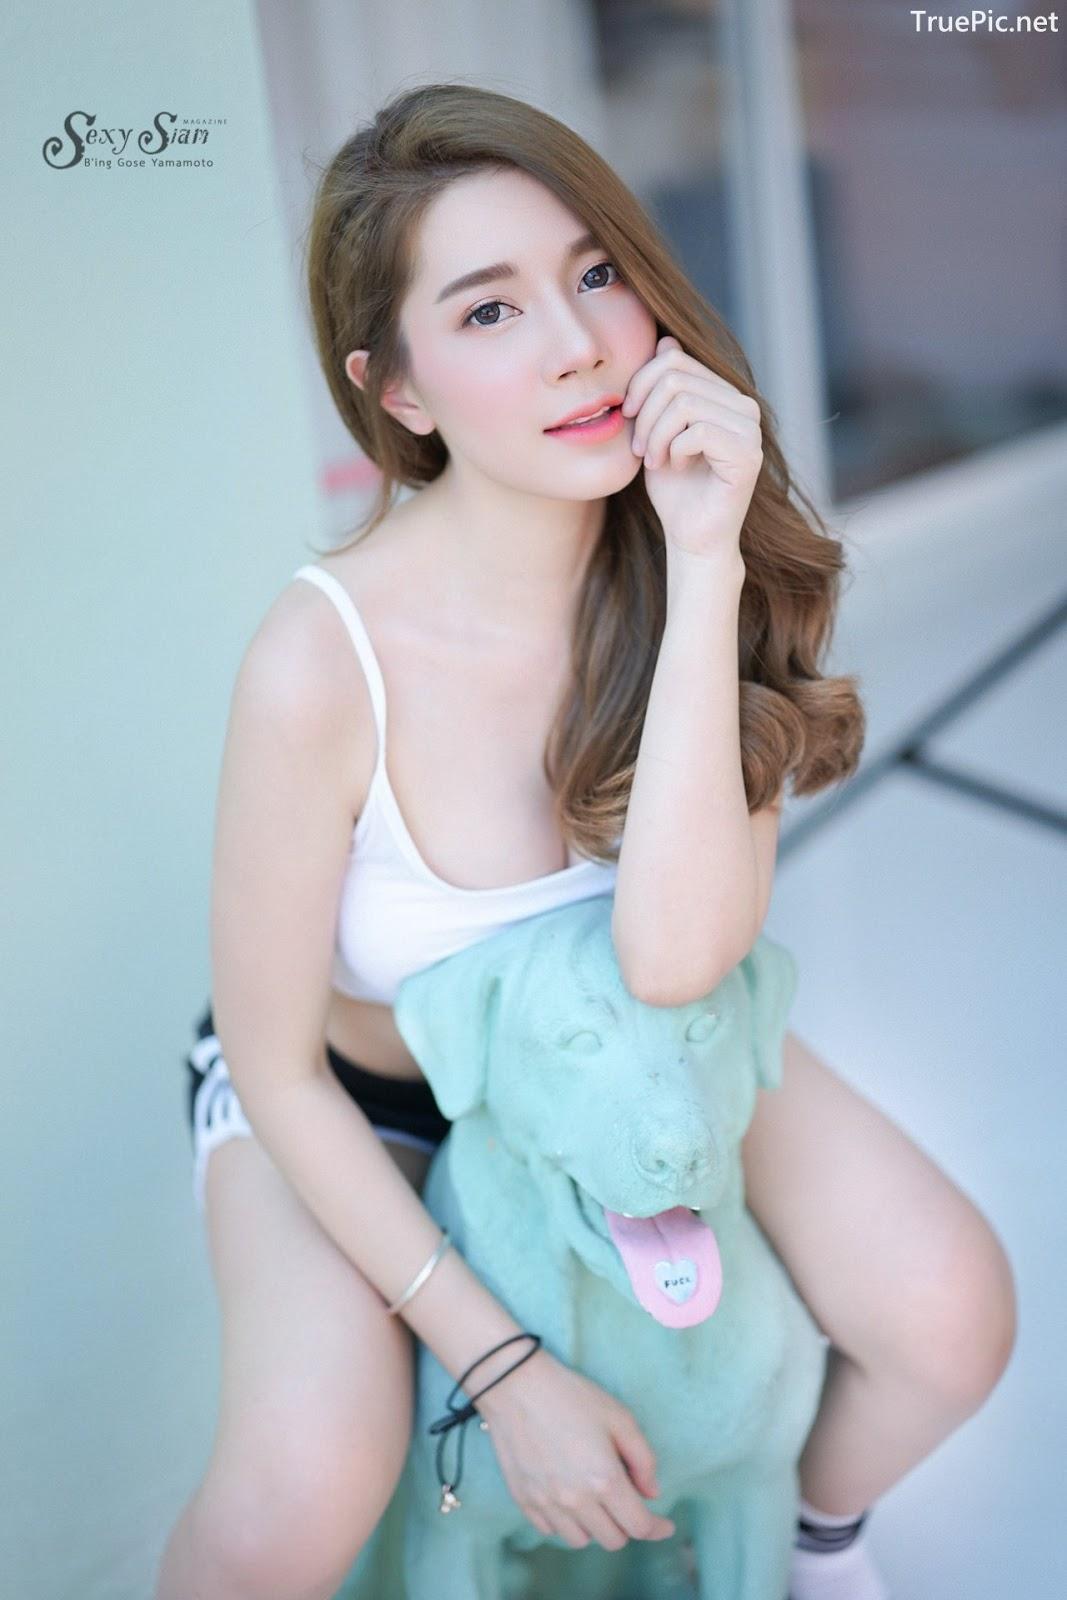 Image Thailand Model - Sasipa Tungmay Jibkrapong - White Crop Top - TruePic.net - Picture-1